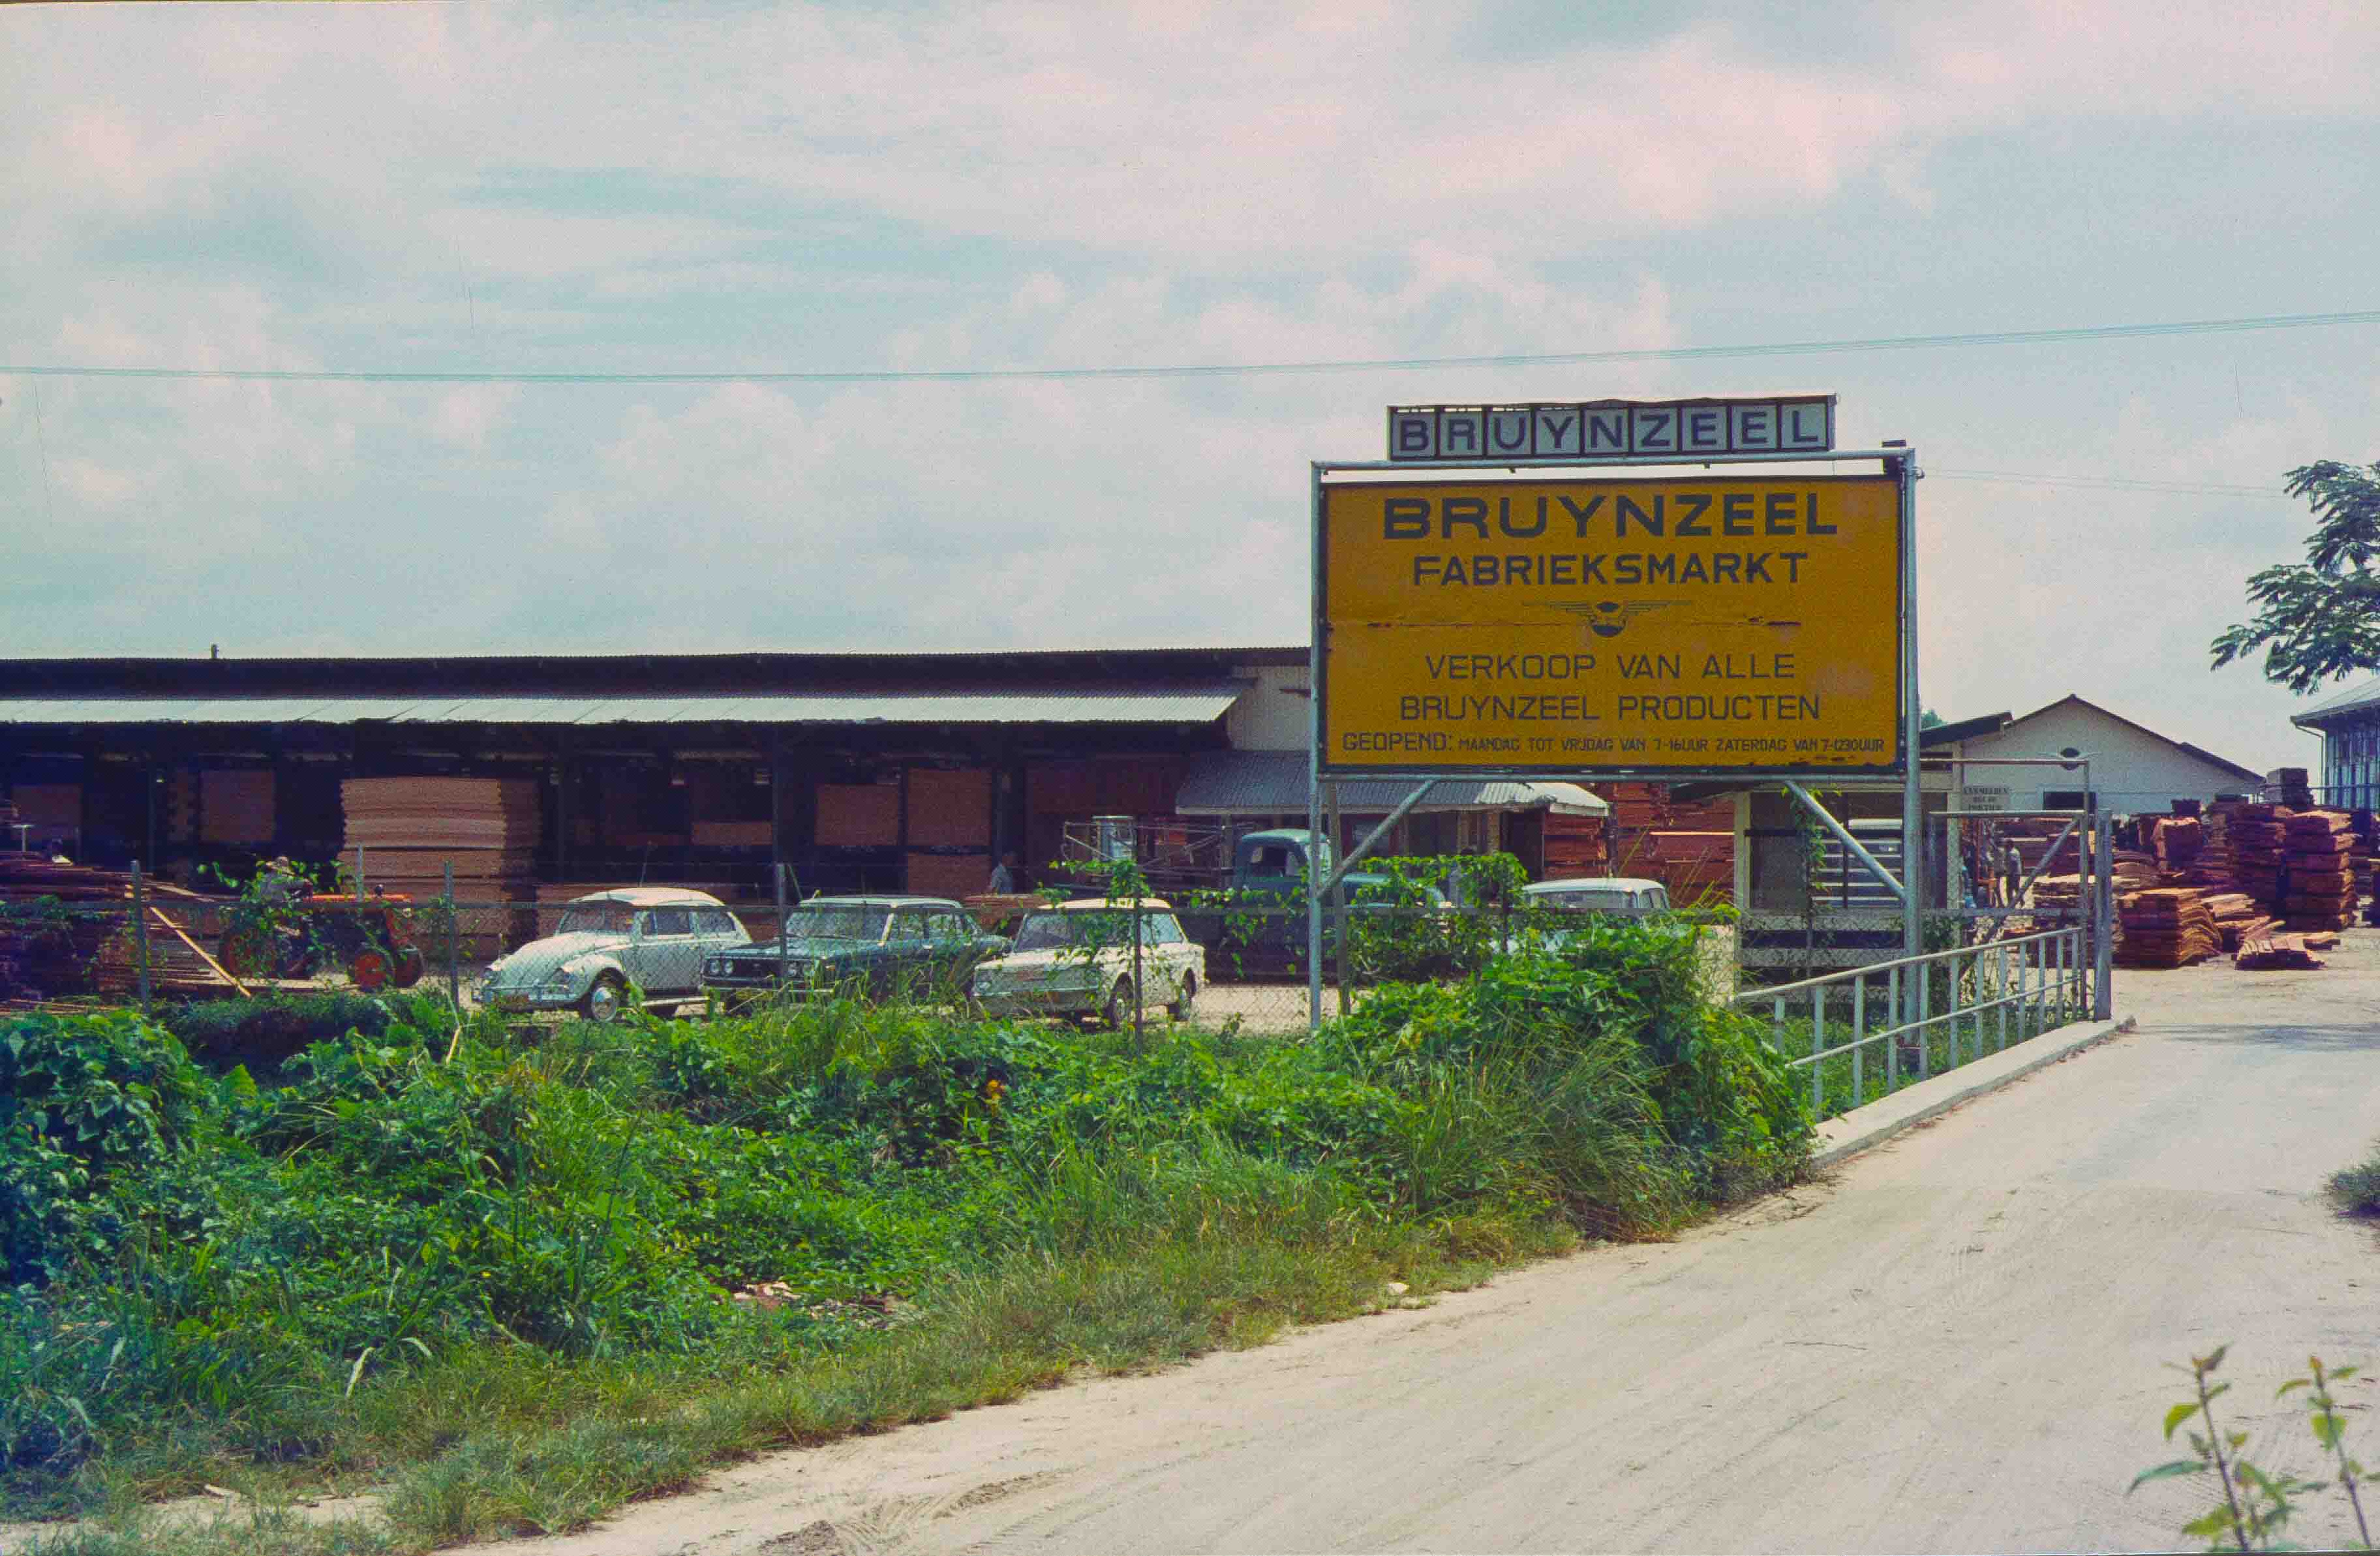 562. Suriname